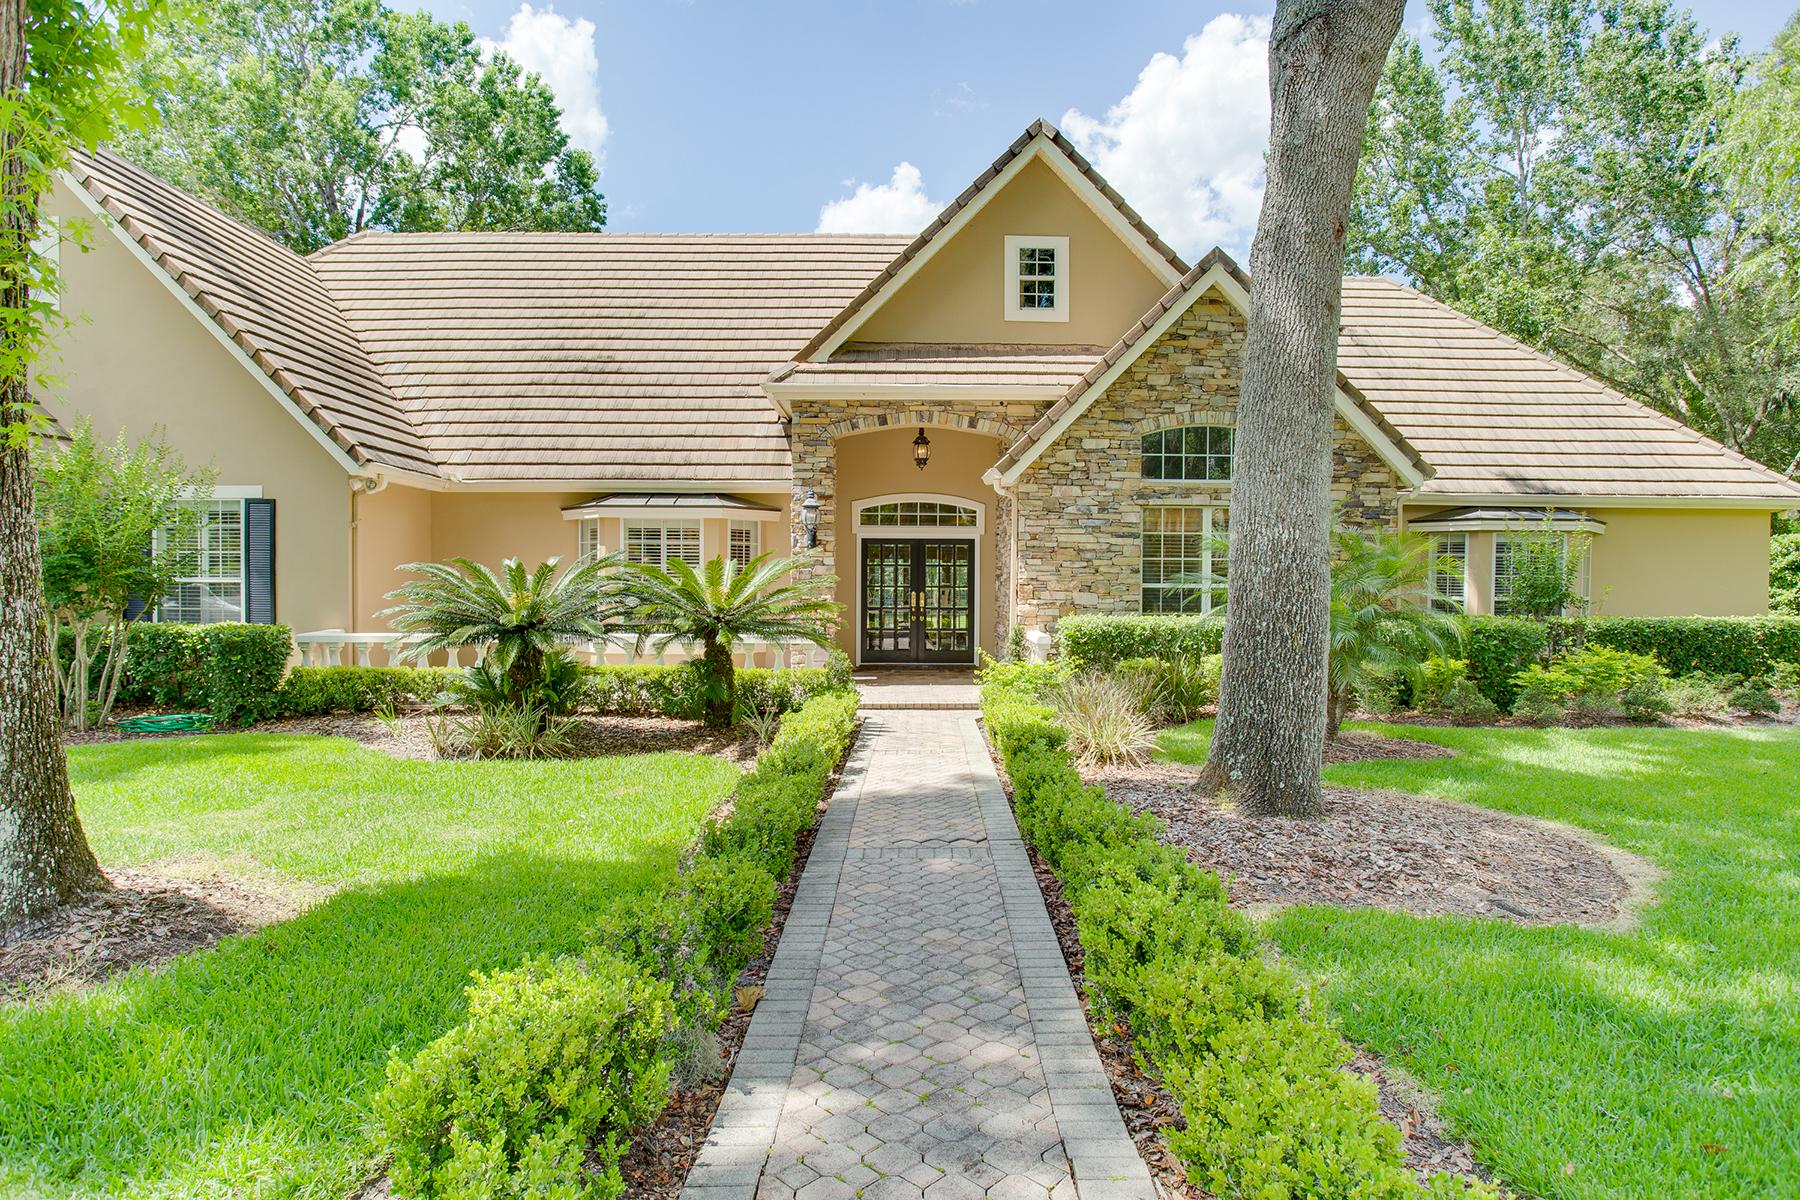 Villa per Vendita alle ore ORLANDO - LONGWOOD 2748 Deer Berry Ct Longwood, Florida, 32779 Stati Uniti